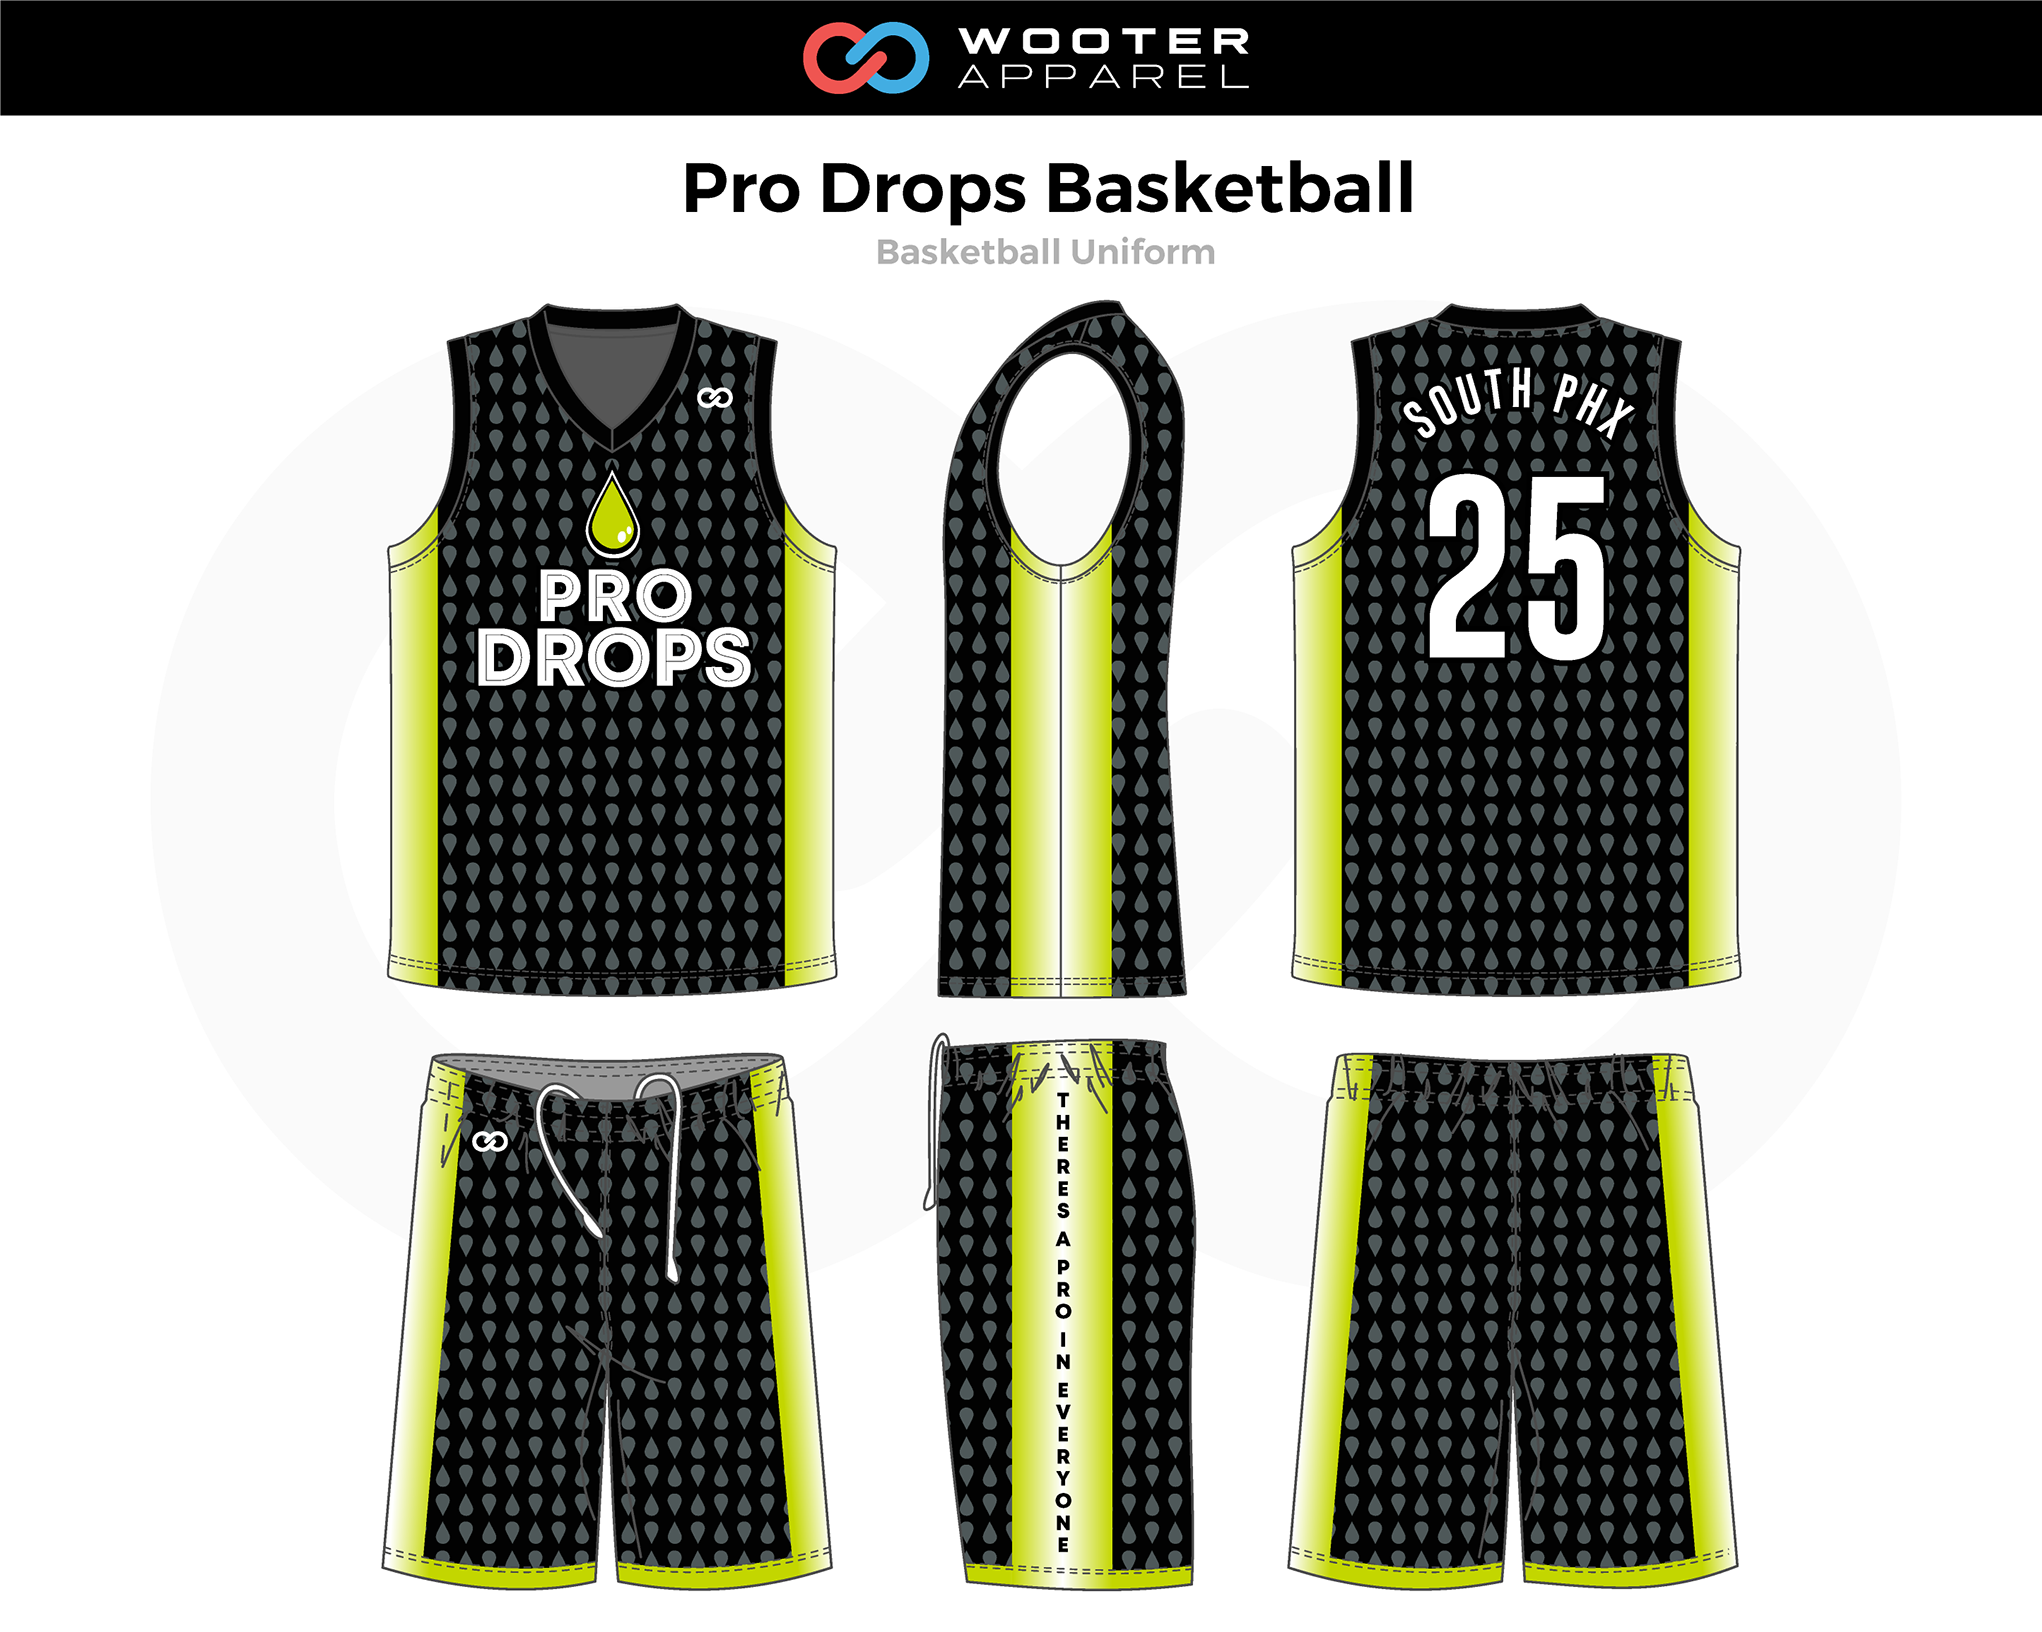 PRO DROPS Black Yellow White Basketball Uniform, Jersey and Shorts